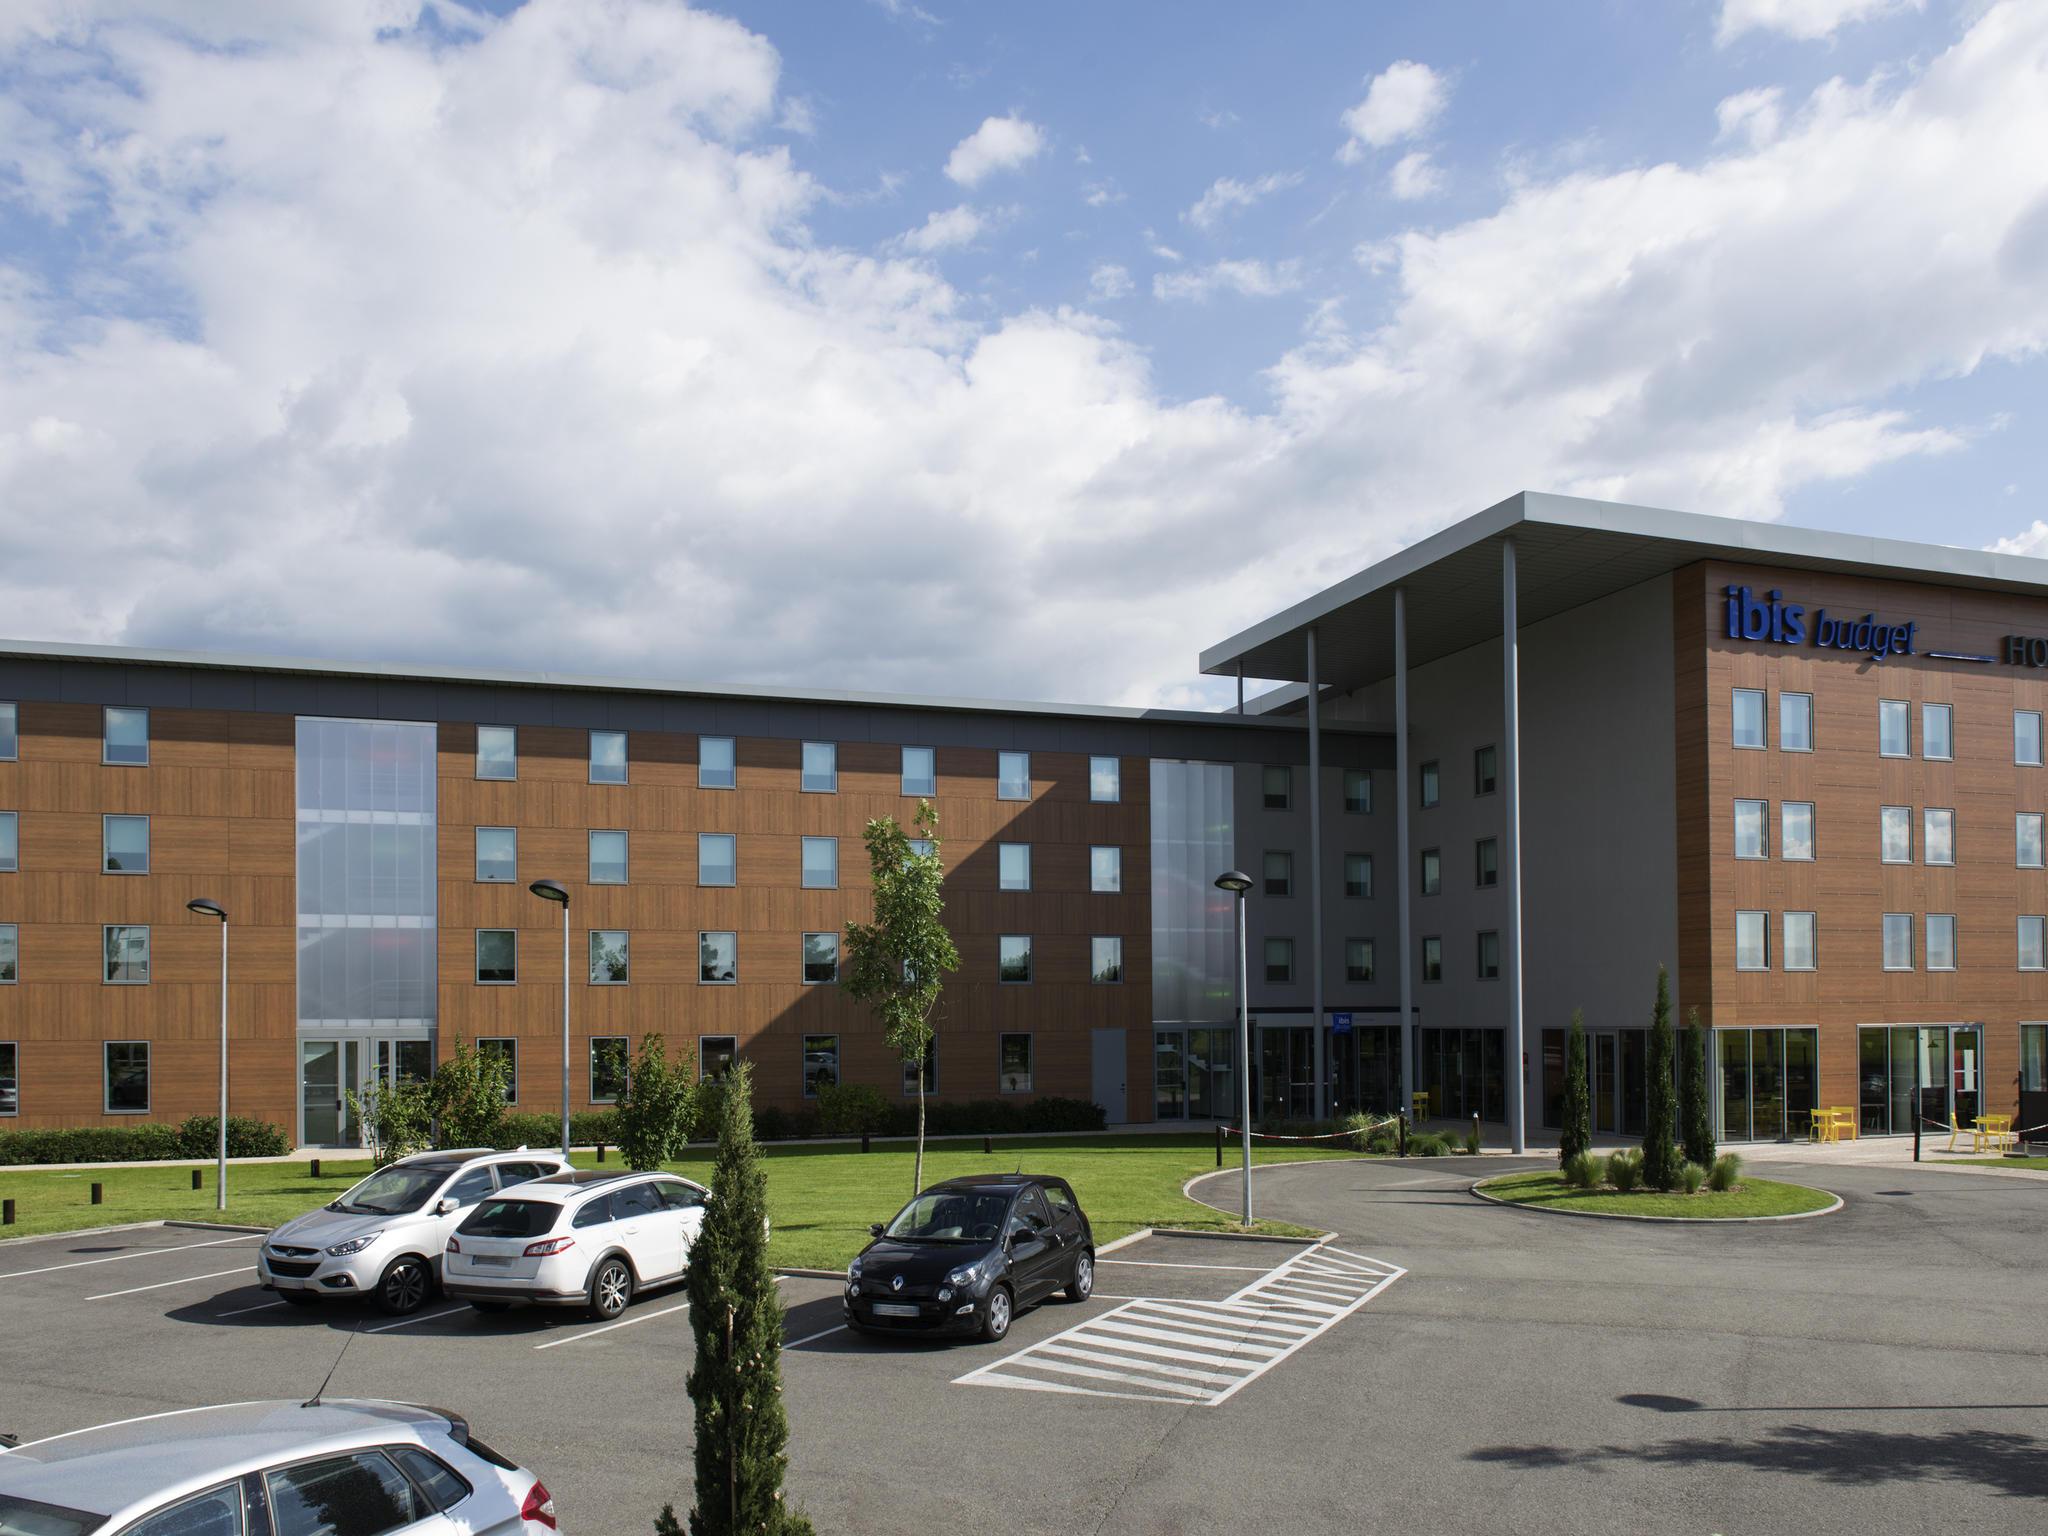 Hotel – ibis budget Aéroport Lyon Saint-Exupéry